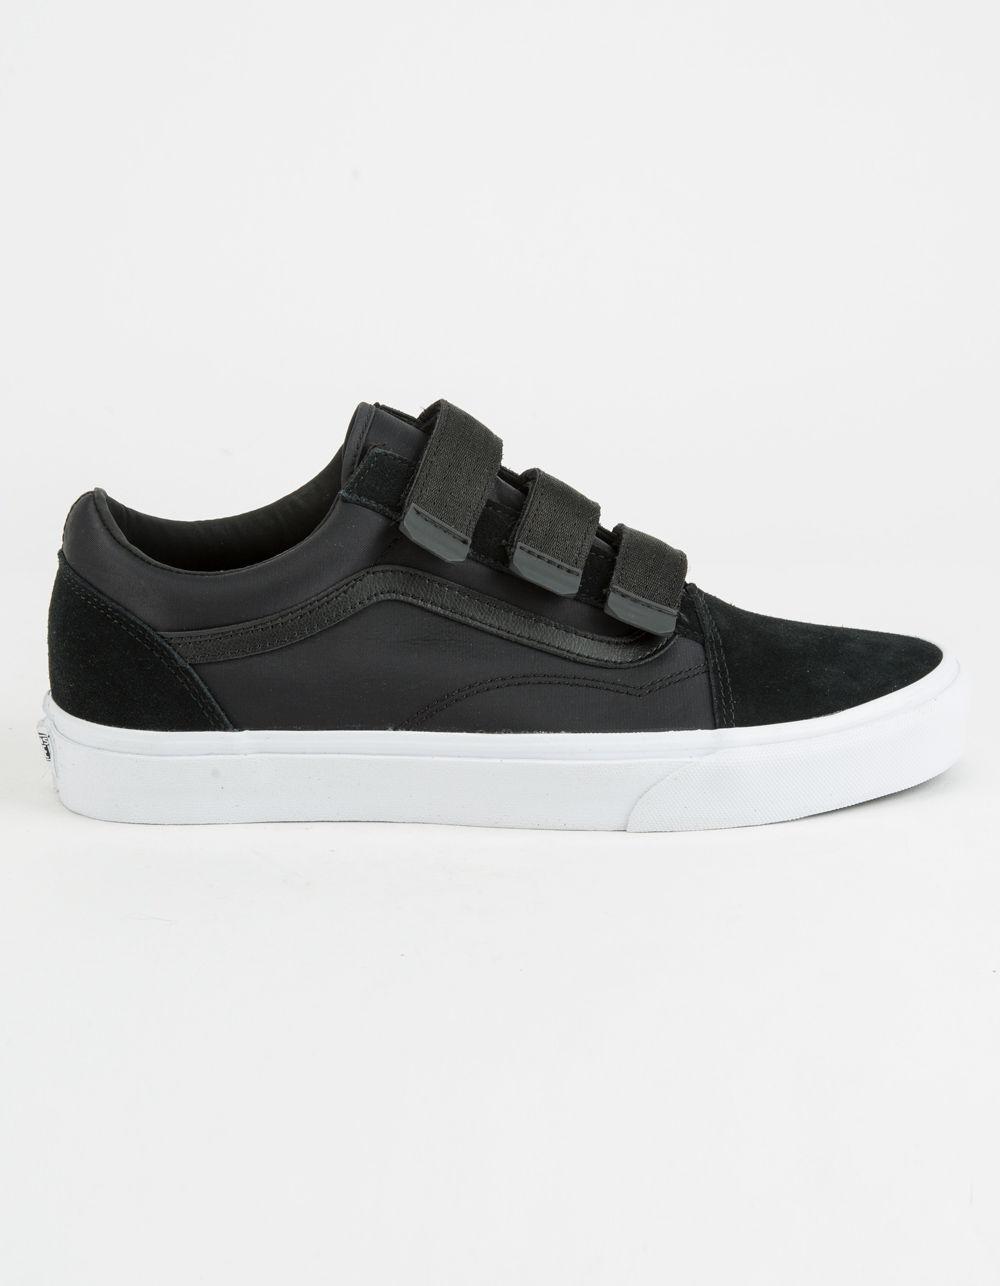 Lyst - Vans Old Skool V Surplus Nylon Black Mens Shoes in Black for Men d9f00e7a4